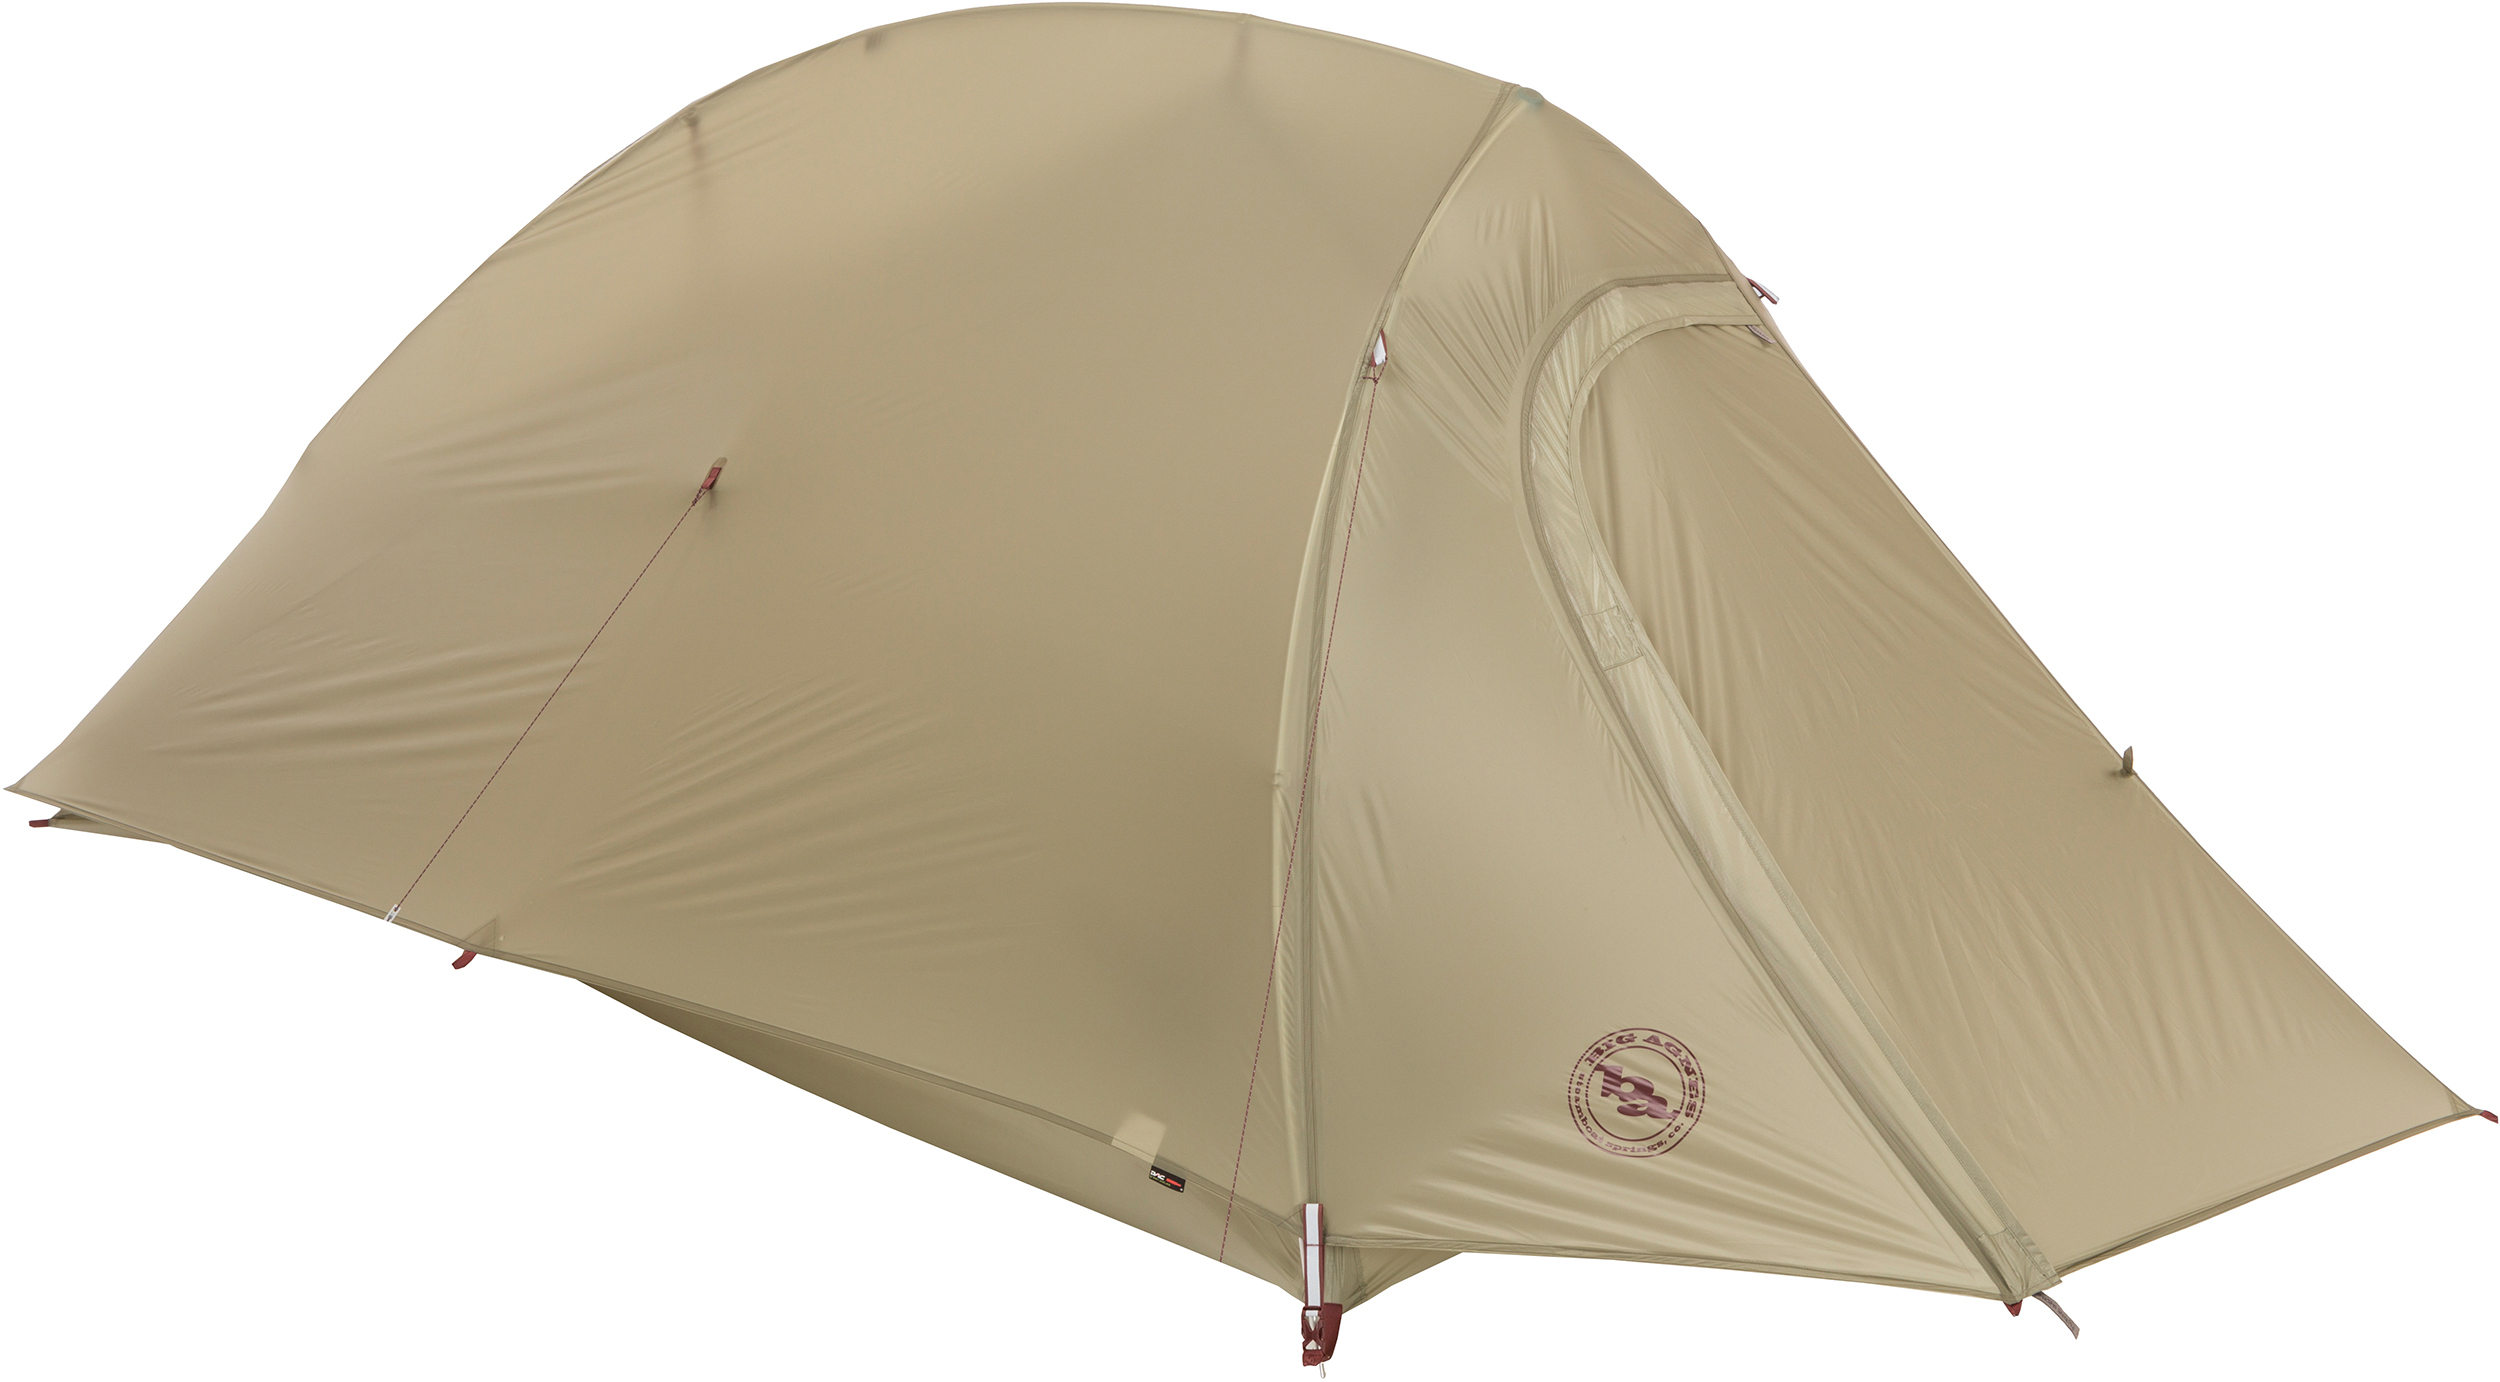 5046203-OLV54-ALT-FLYCLOSED.jpg  sc 1 st  MEC & Big Agnes Fly Creek HV Ultralight 1-Person Tent